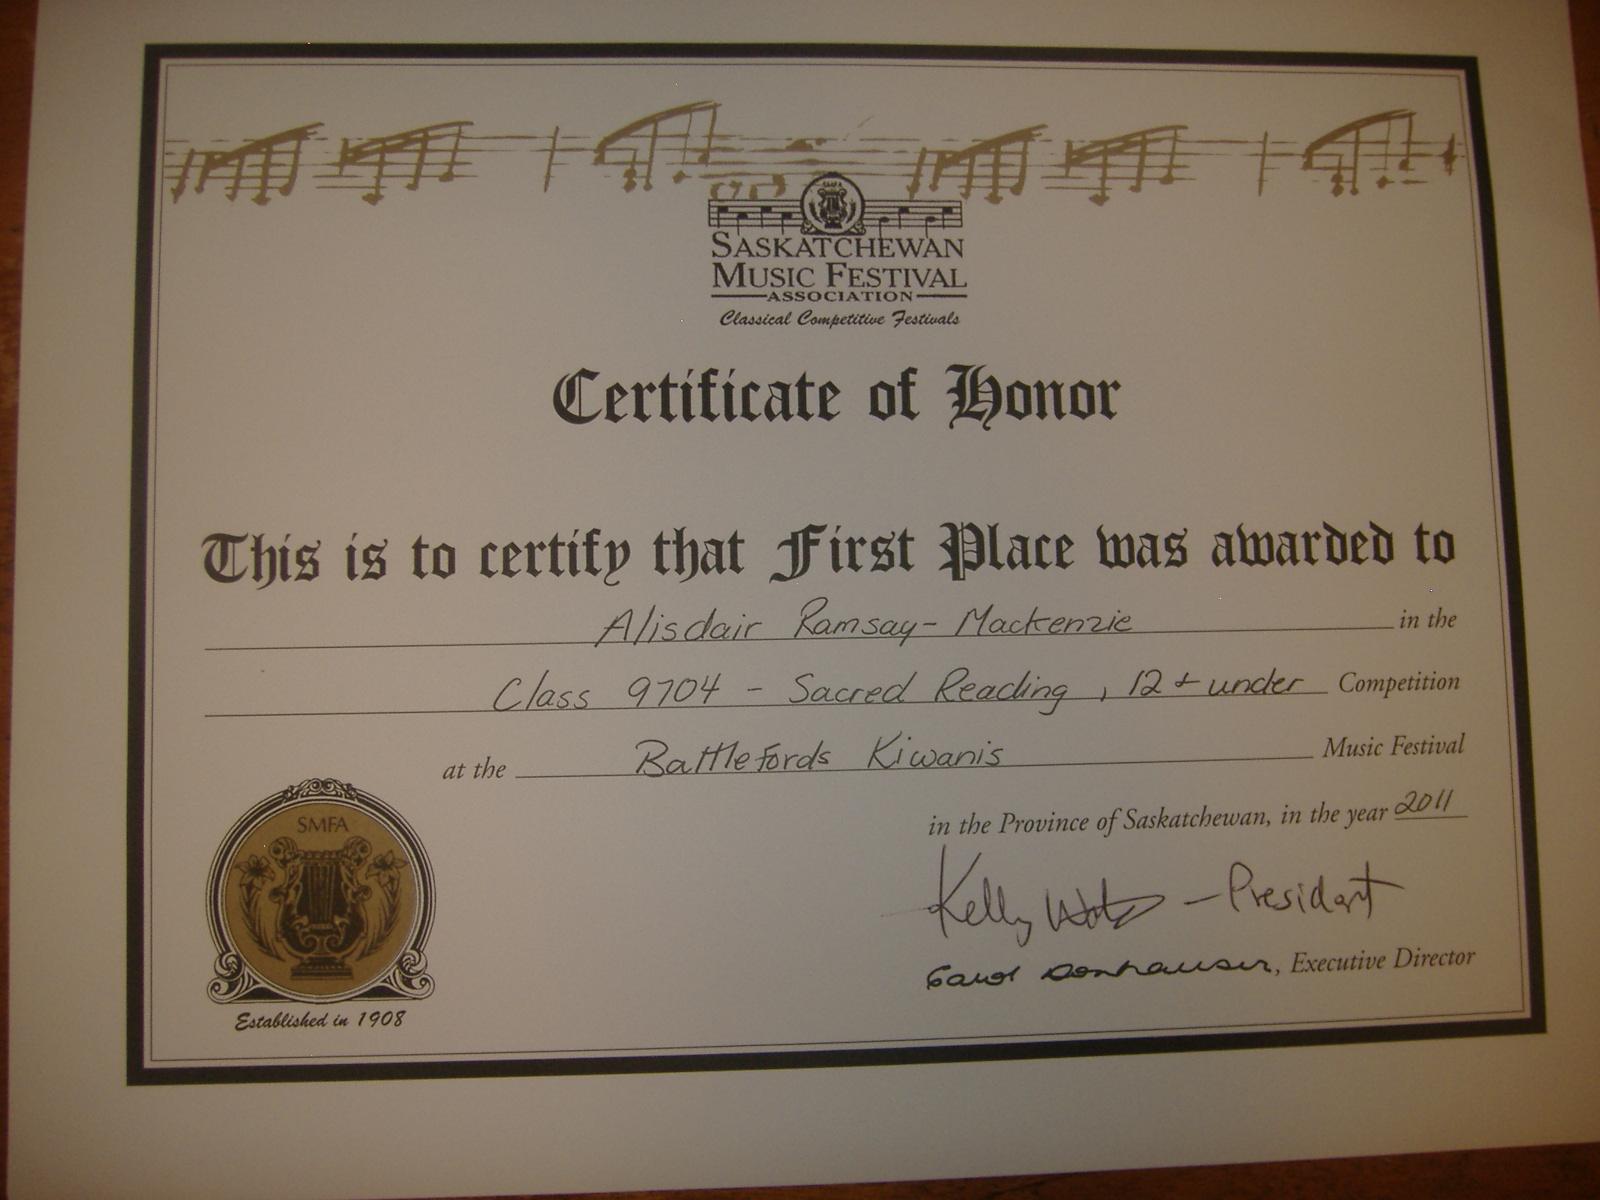 First Place Certificate First place certificate